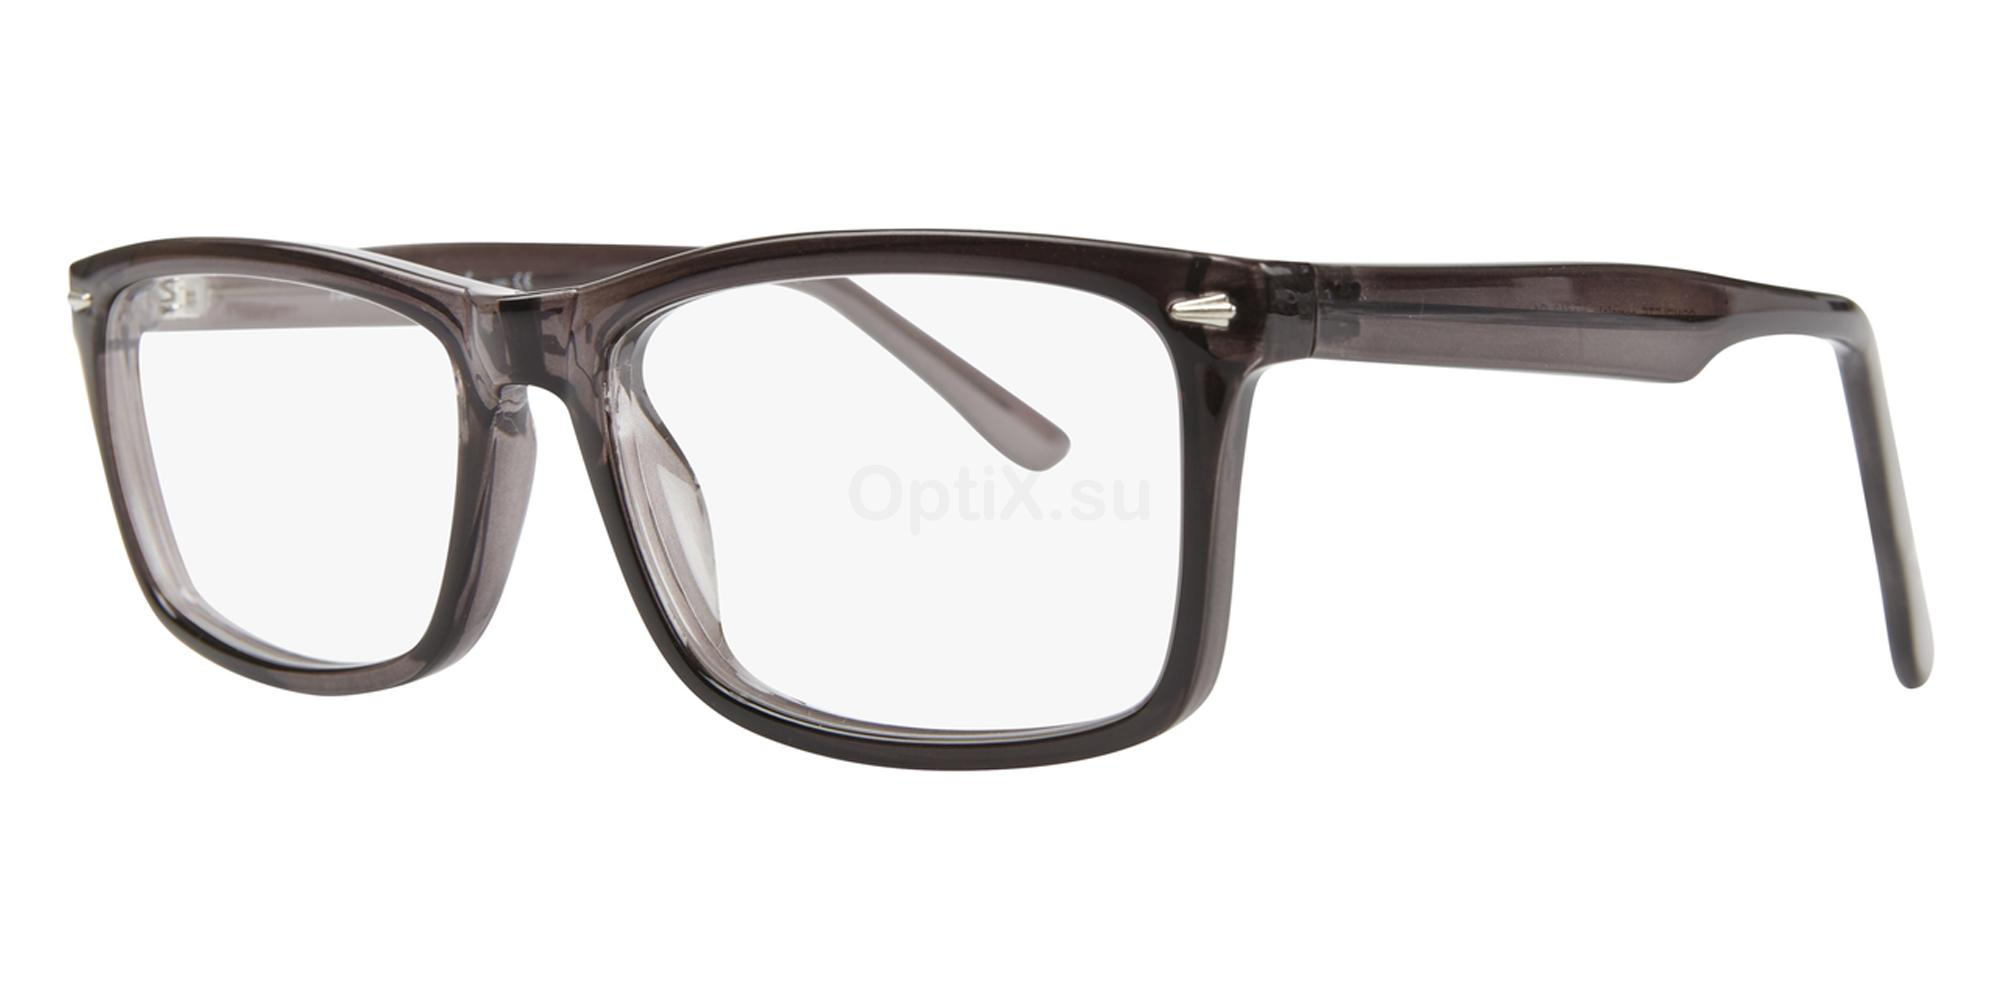 C1 Complete 2 Mod 10 Glasses, Complete